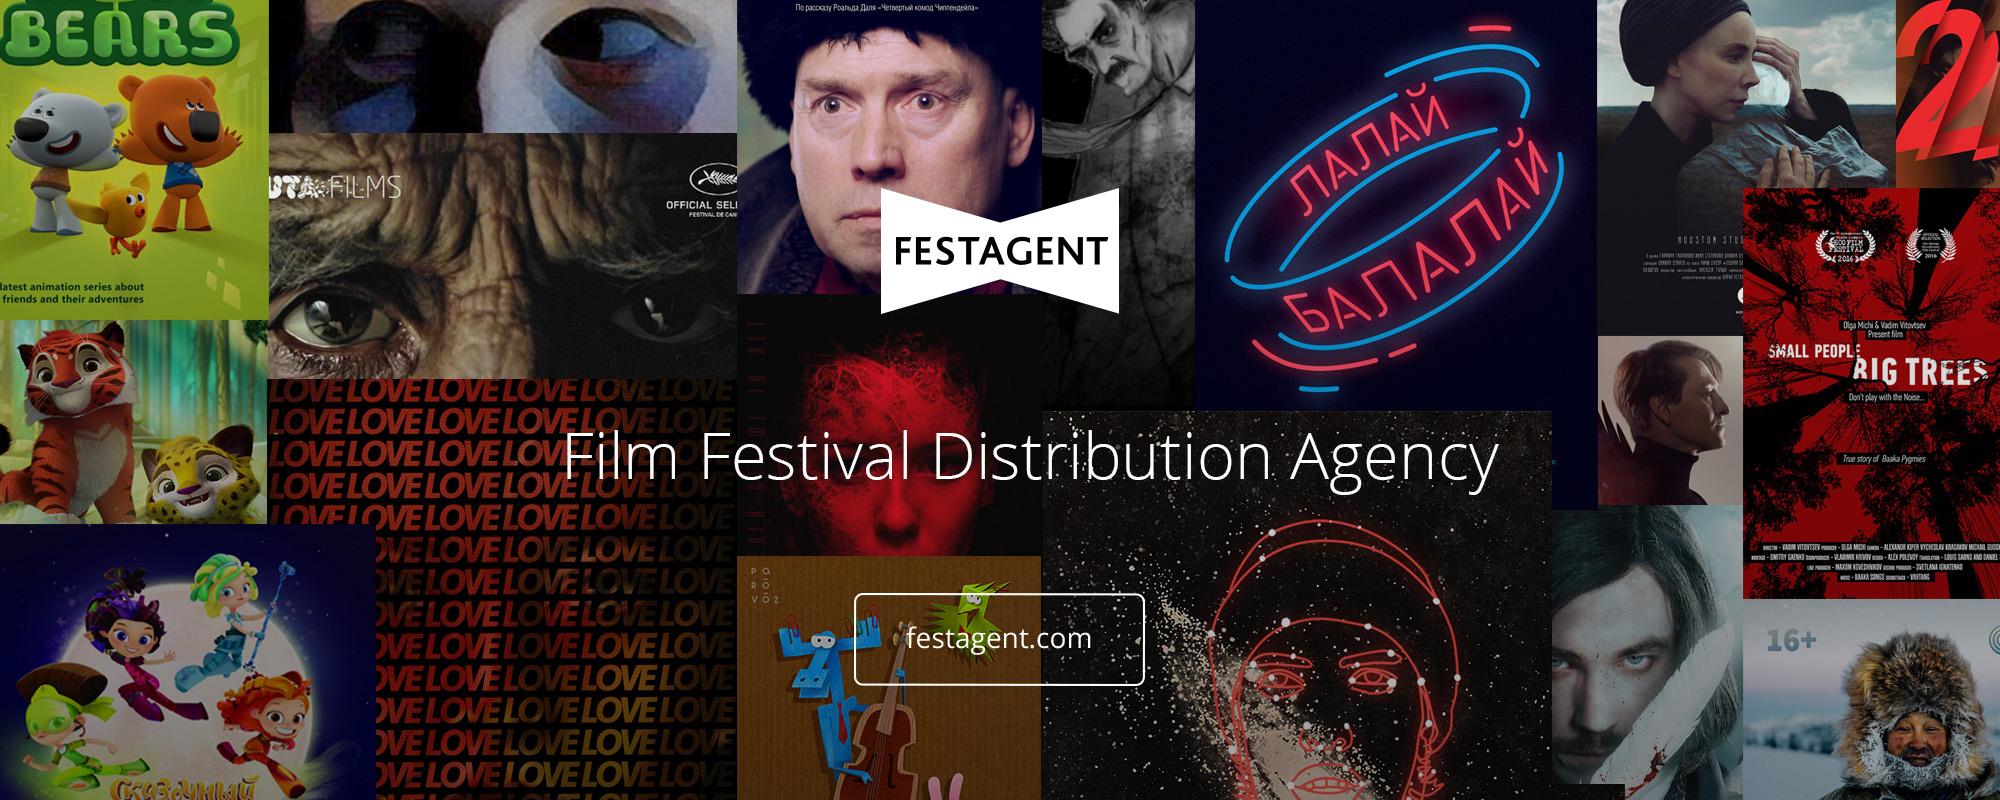 Festagent Film Festival Distribution Agency